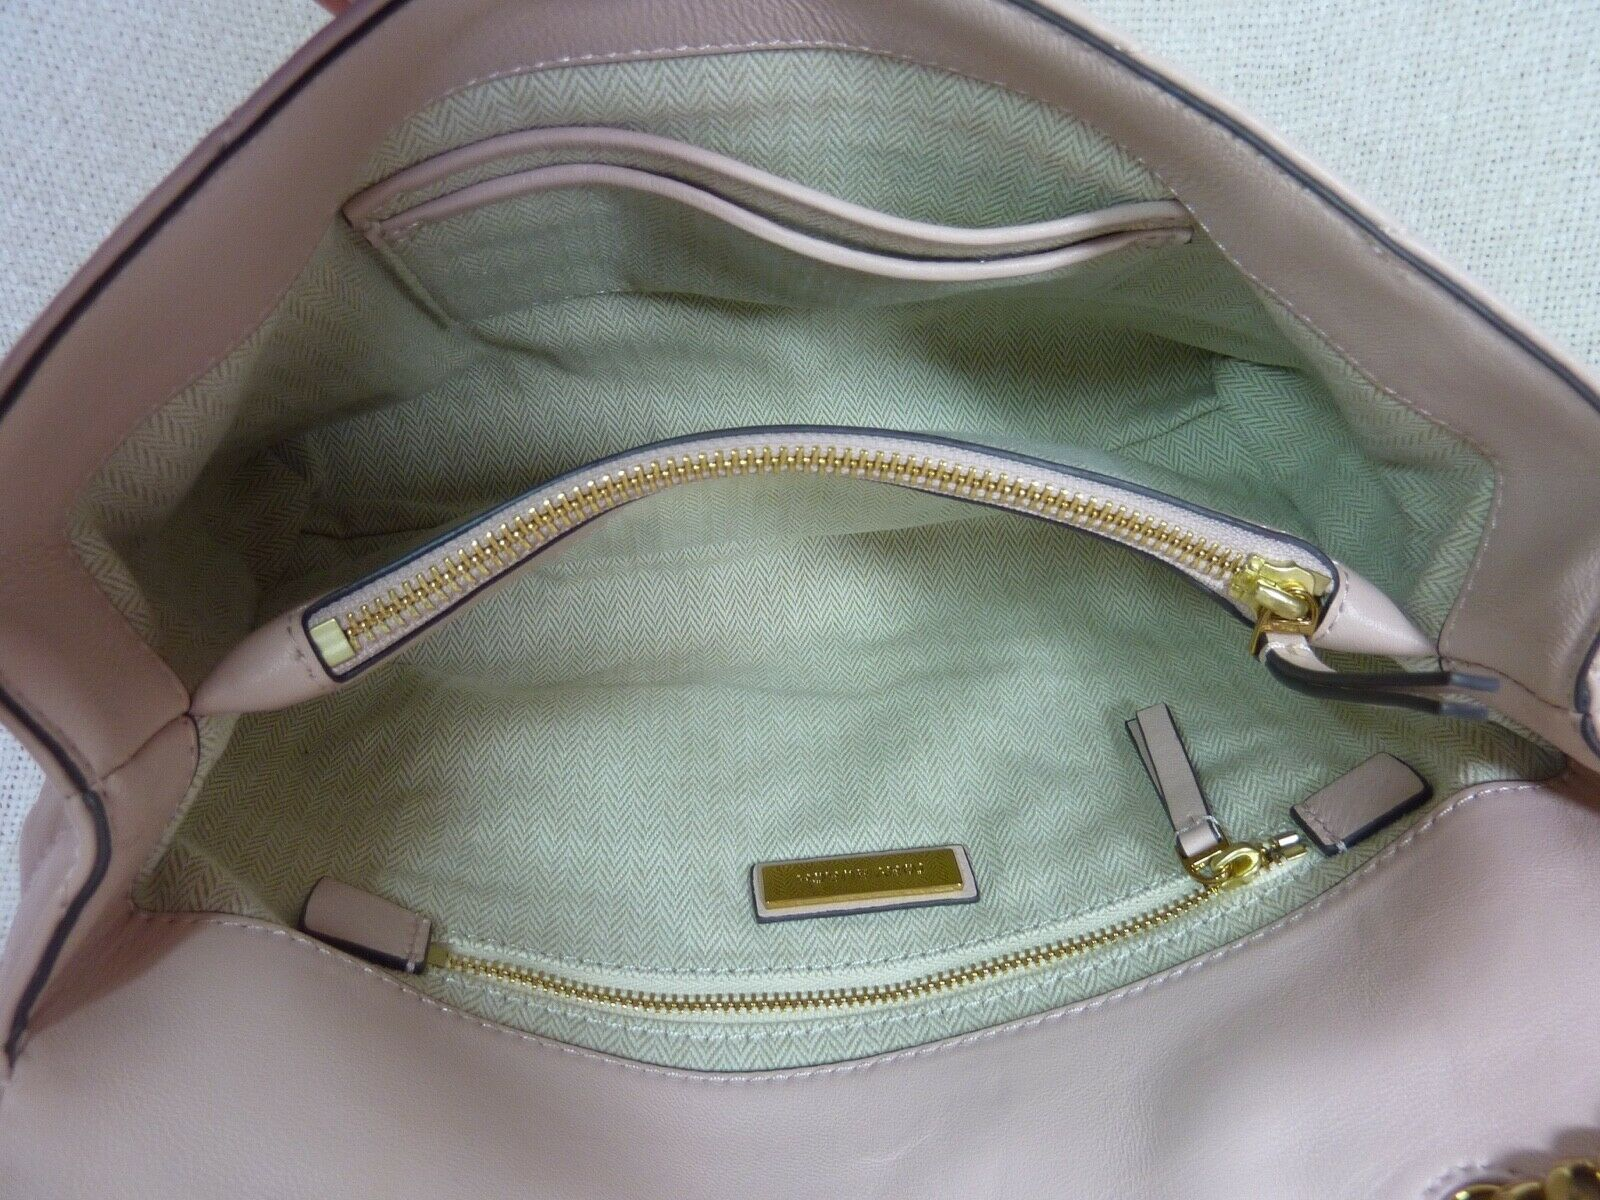 NWT Tory Burch Pink Moon Kira Chevron Convertible Shoulder Bag $528 image 10